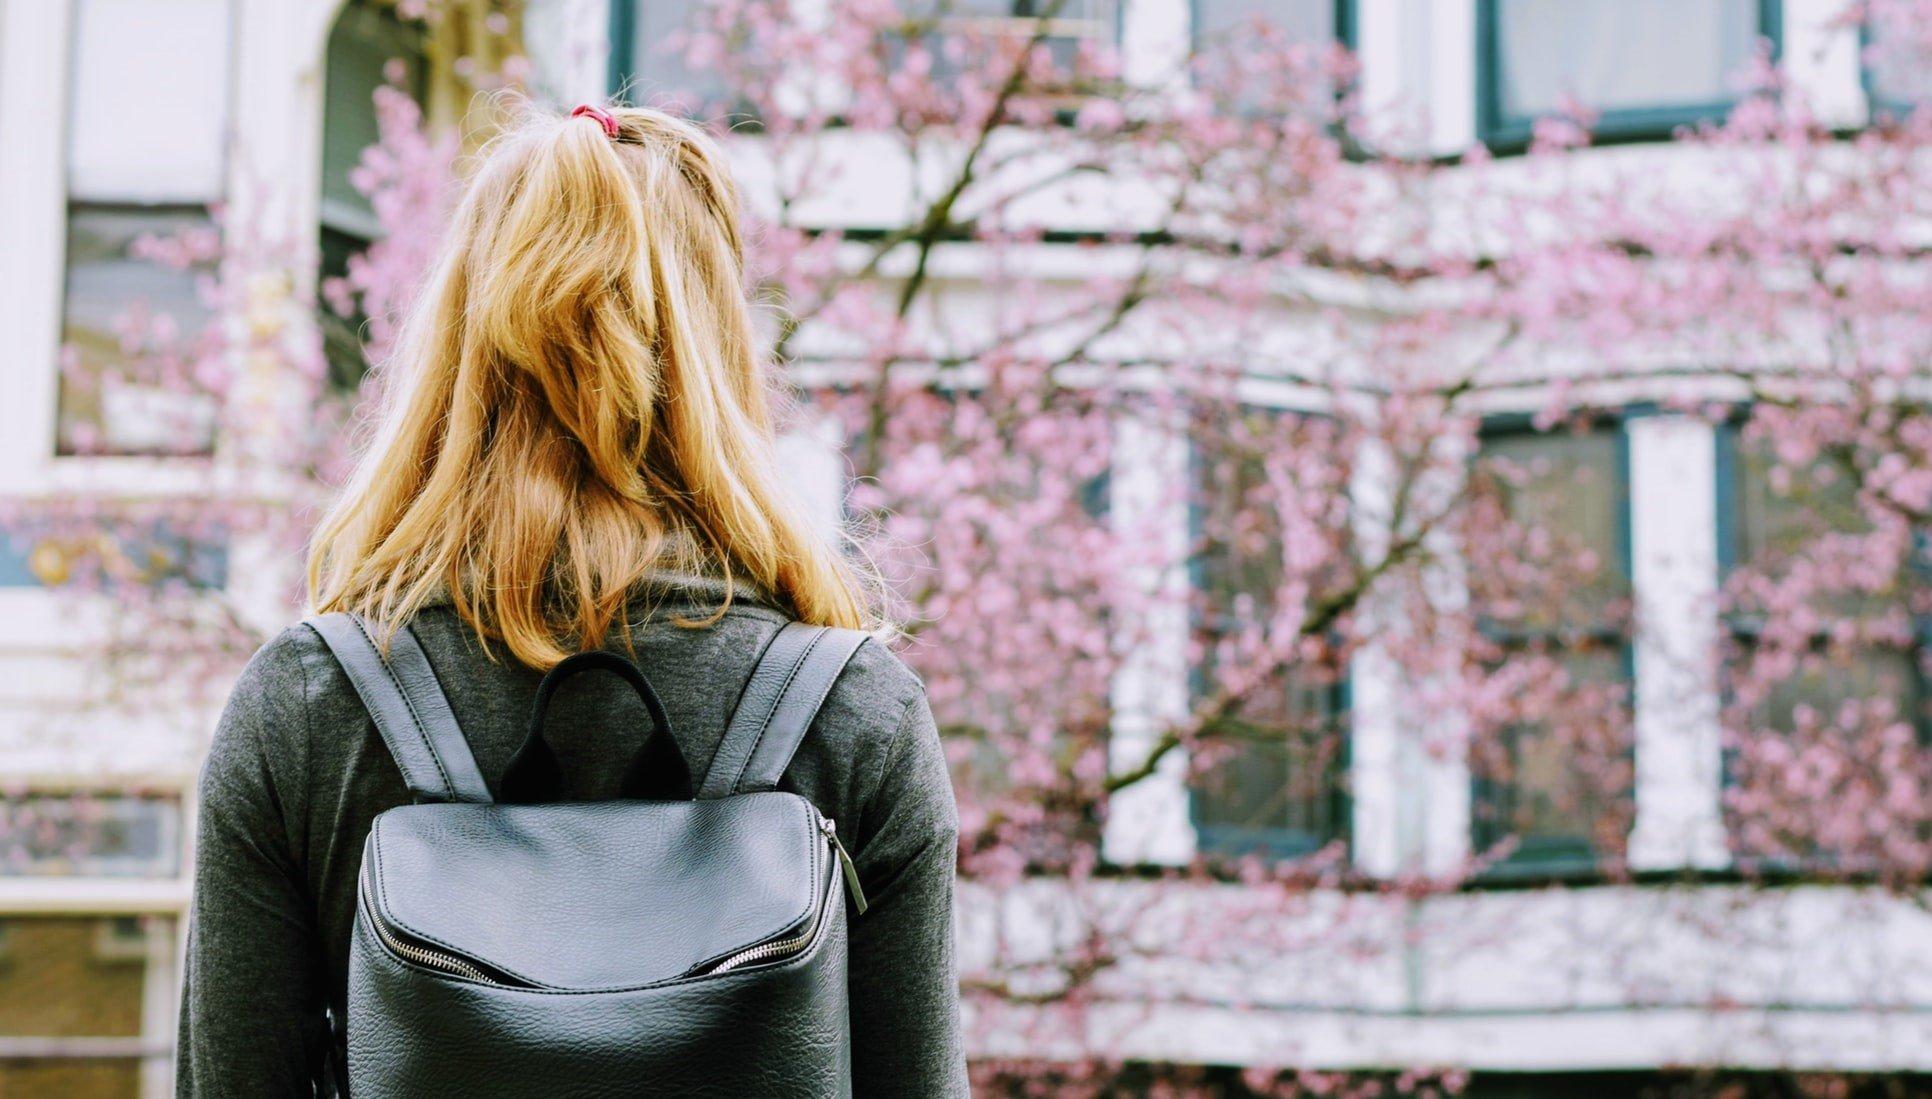 Woman w backpack